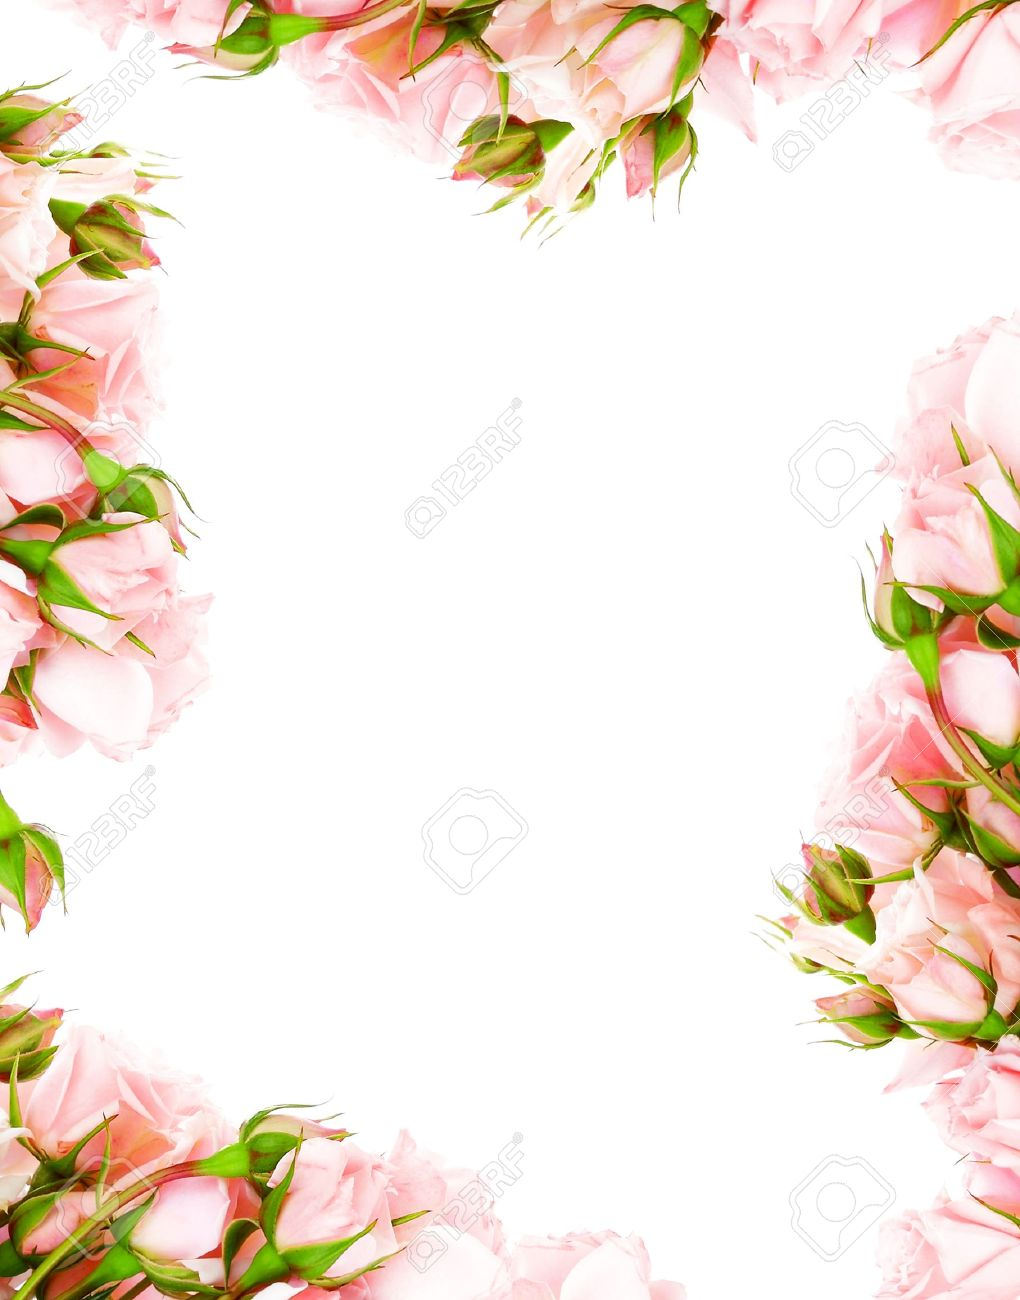 Fresh Pink Roses Frame Border Isolated On White Background Stock ...